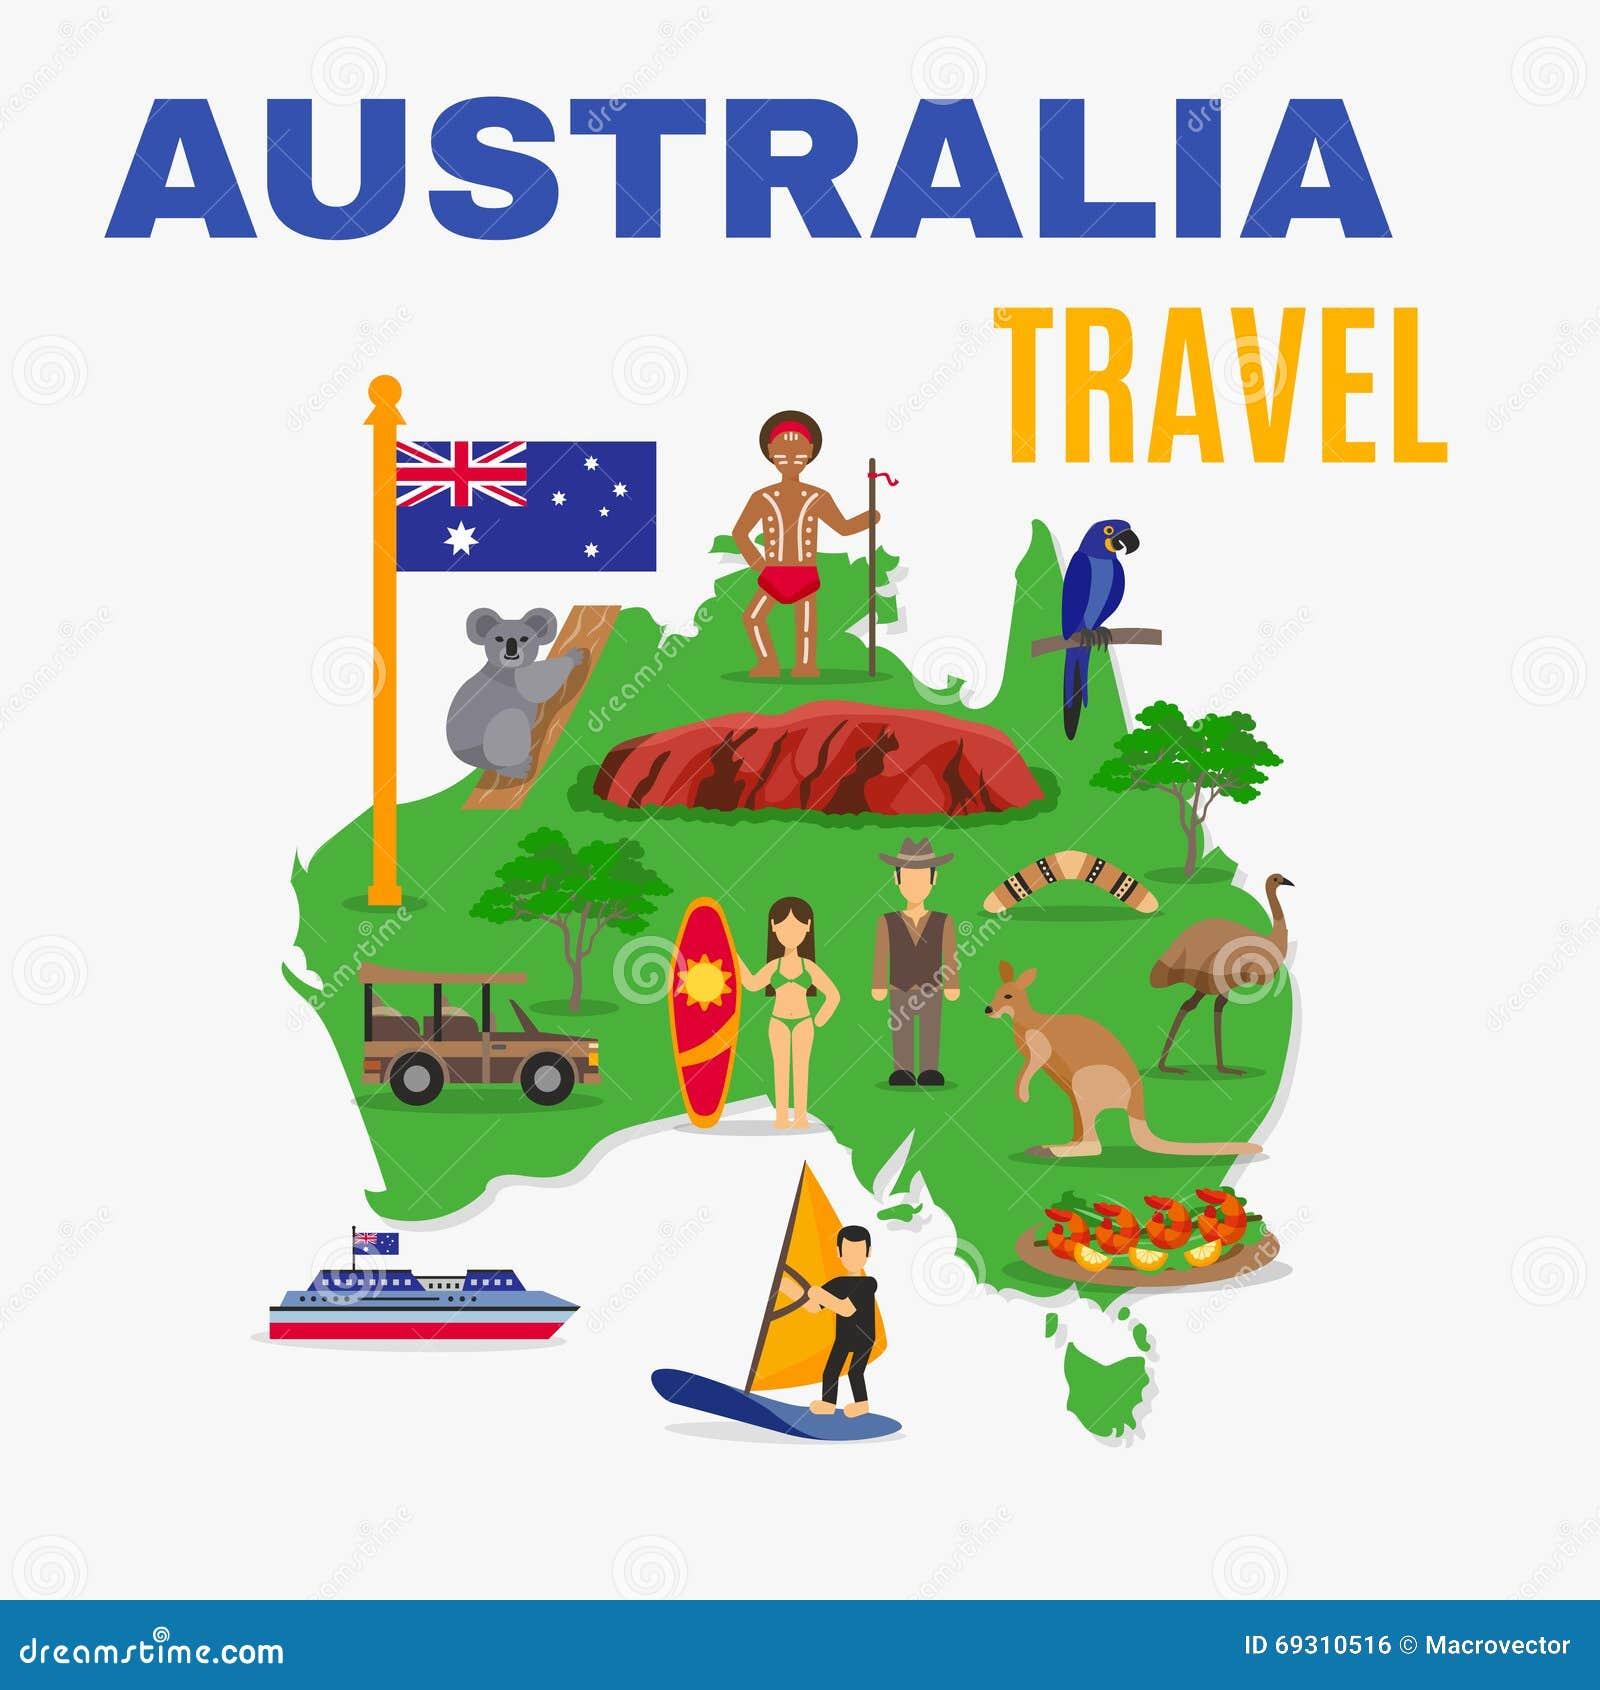 Australia Travel Map Poster Vector Image 69310516 – Travel Map of Australia